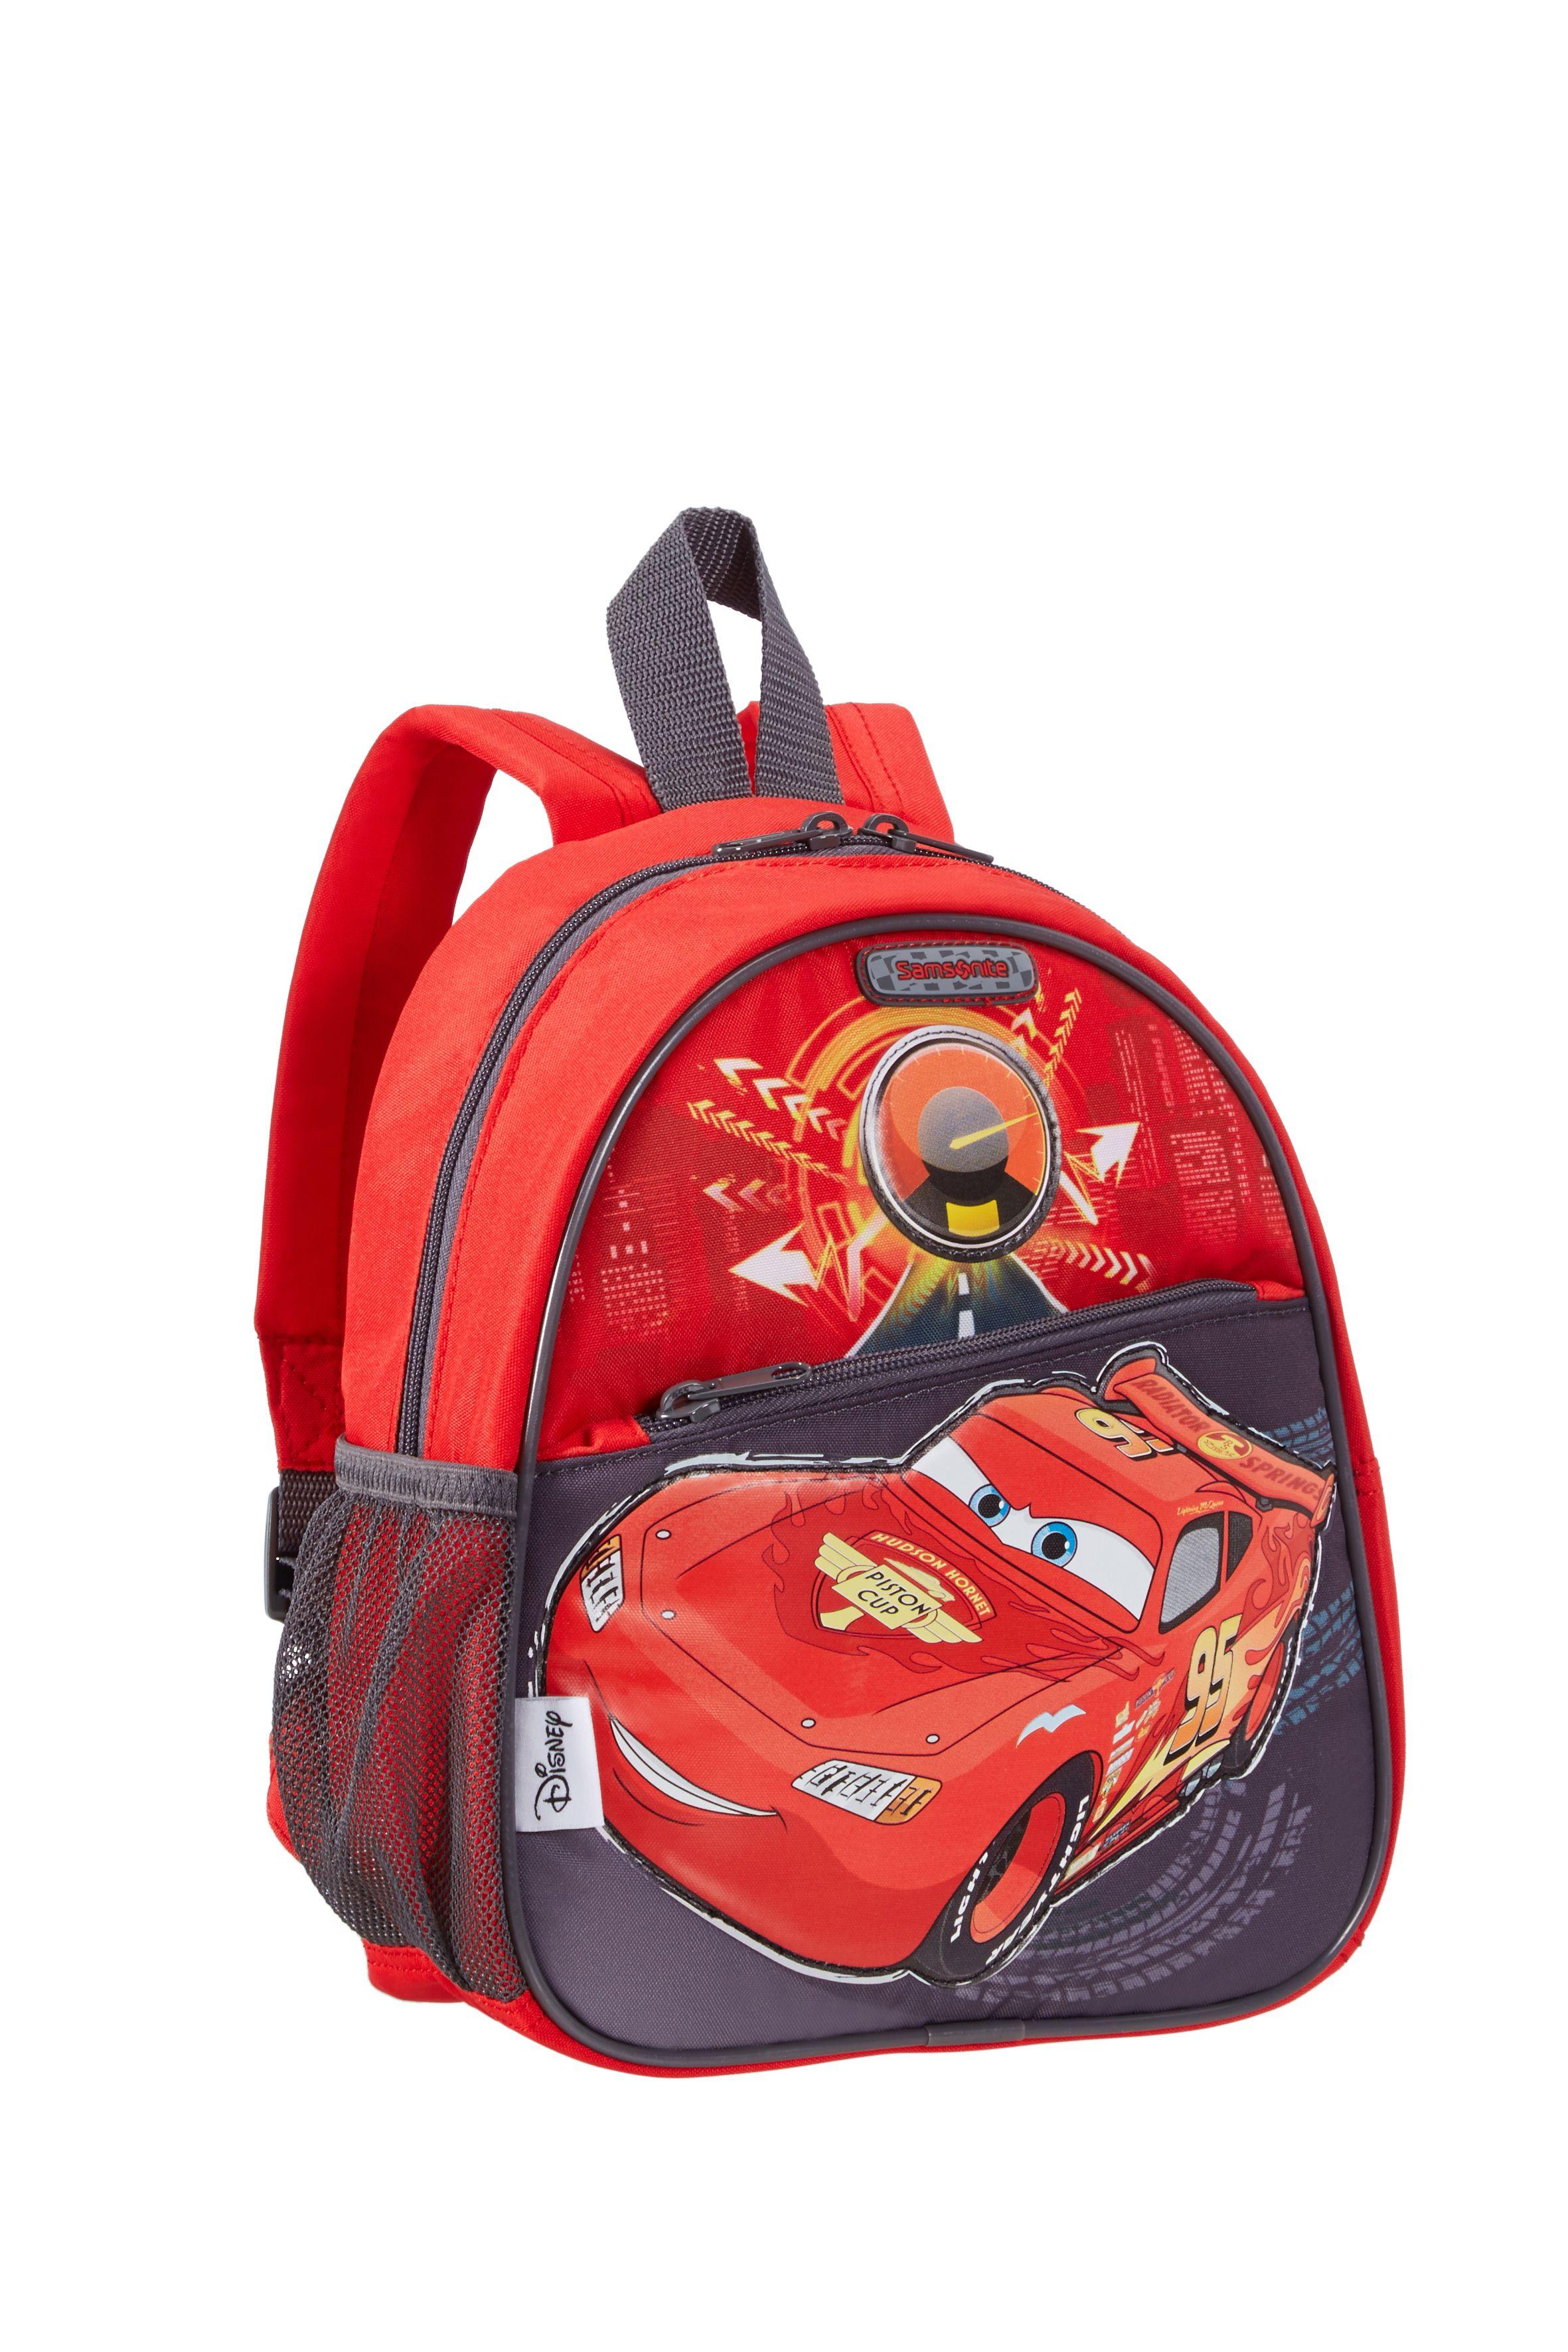 a96f1c8347 Disney Wonder - Cars Backpack Upright #Disney #Samsonite #Cars #Travel  #Kids #School #Schoolbag #MySamsonite #ByYourSide